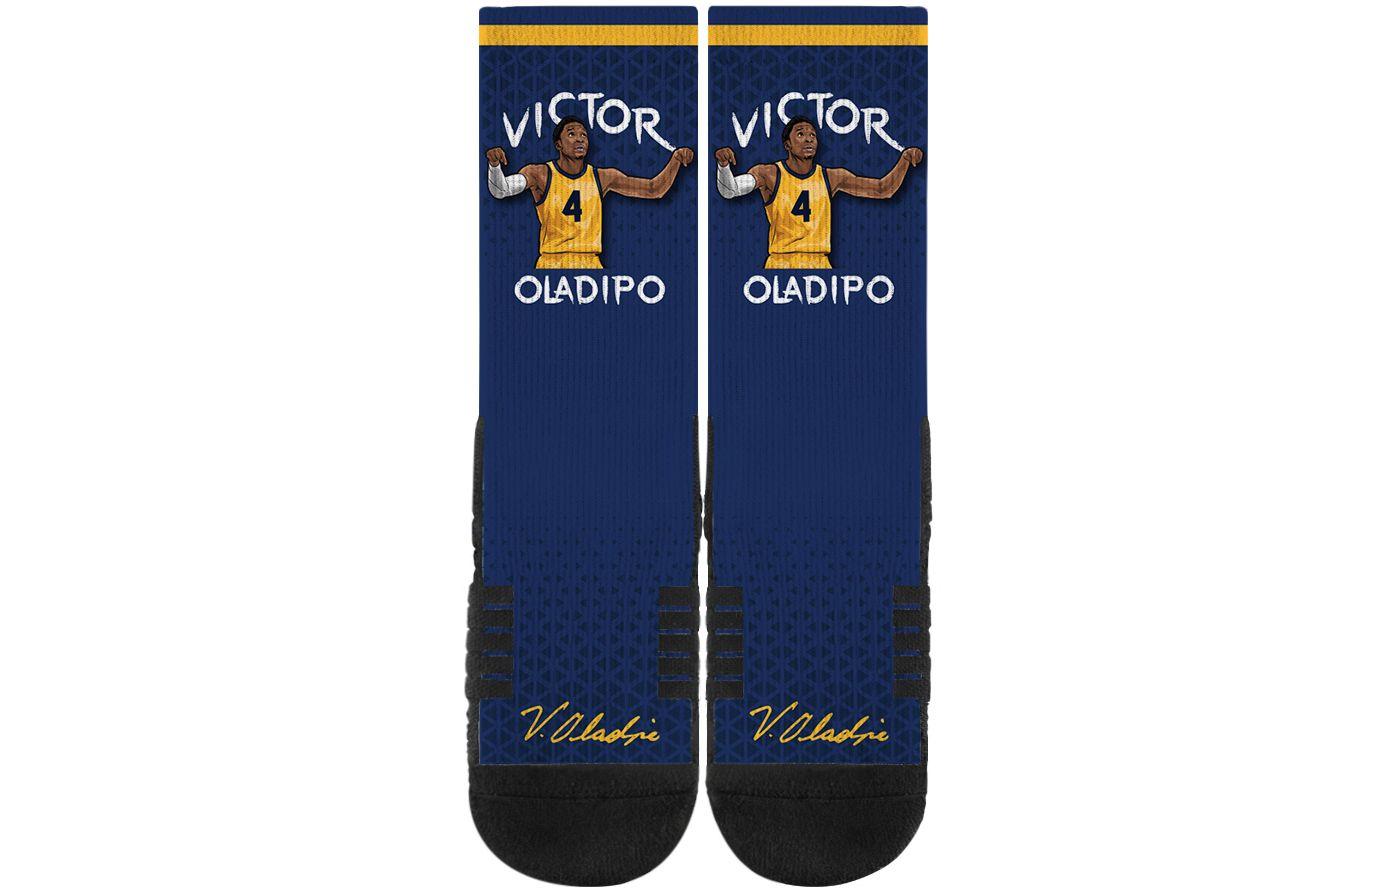 Strideline Indiana Pacers Victor Oladipo Crew Socks